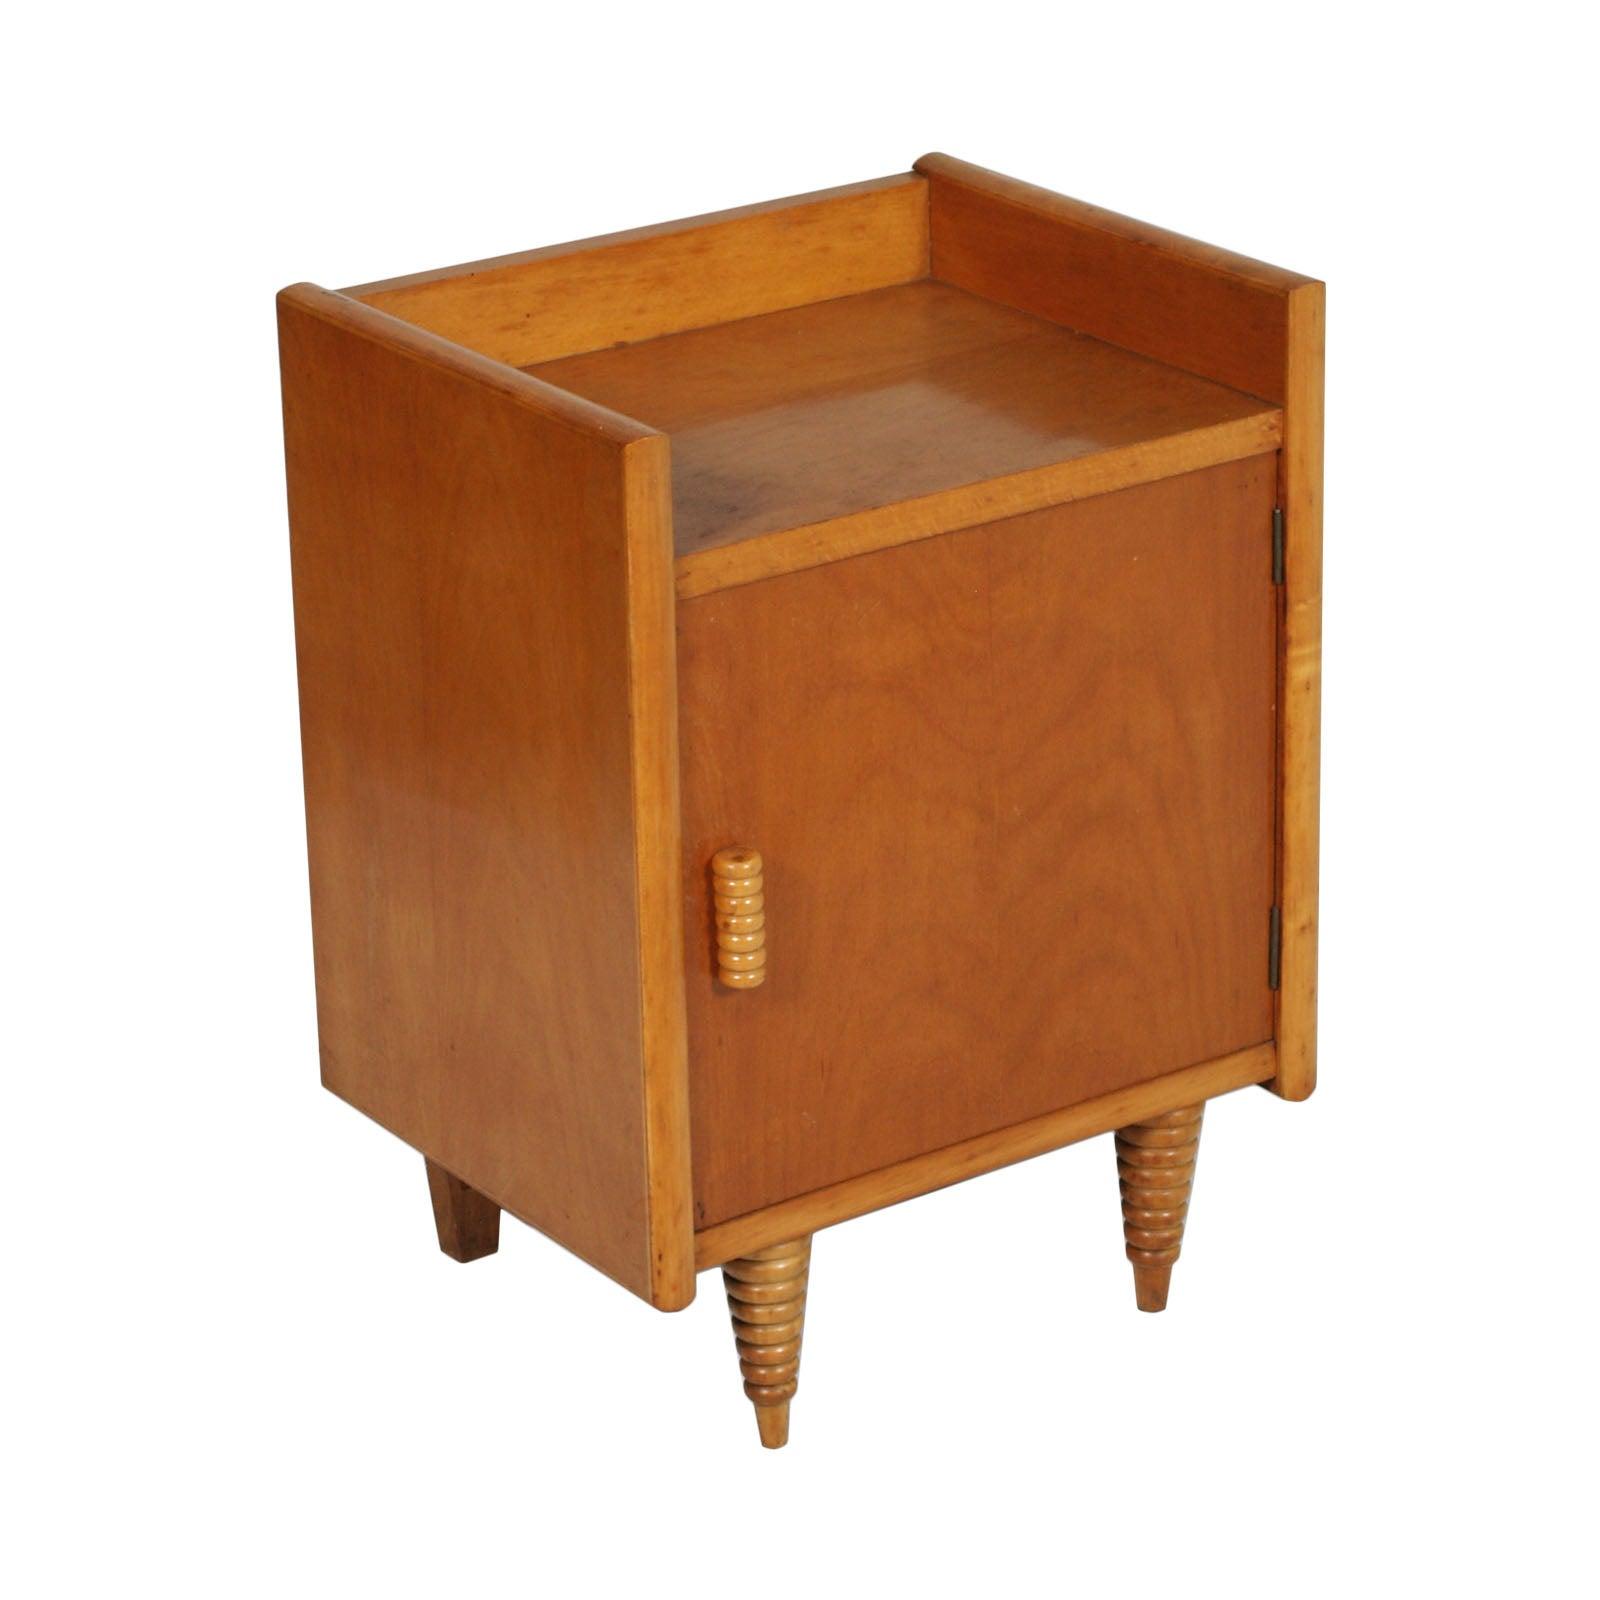 Midcentury Art Deco Nightstand, Gio Ponti Attributed, Blond Walnut Wax Polished